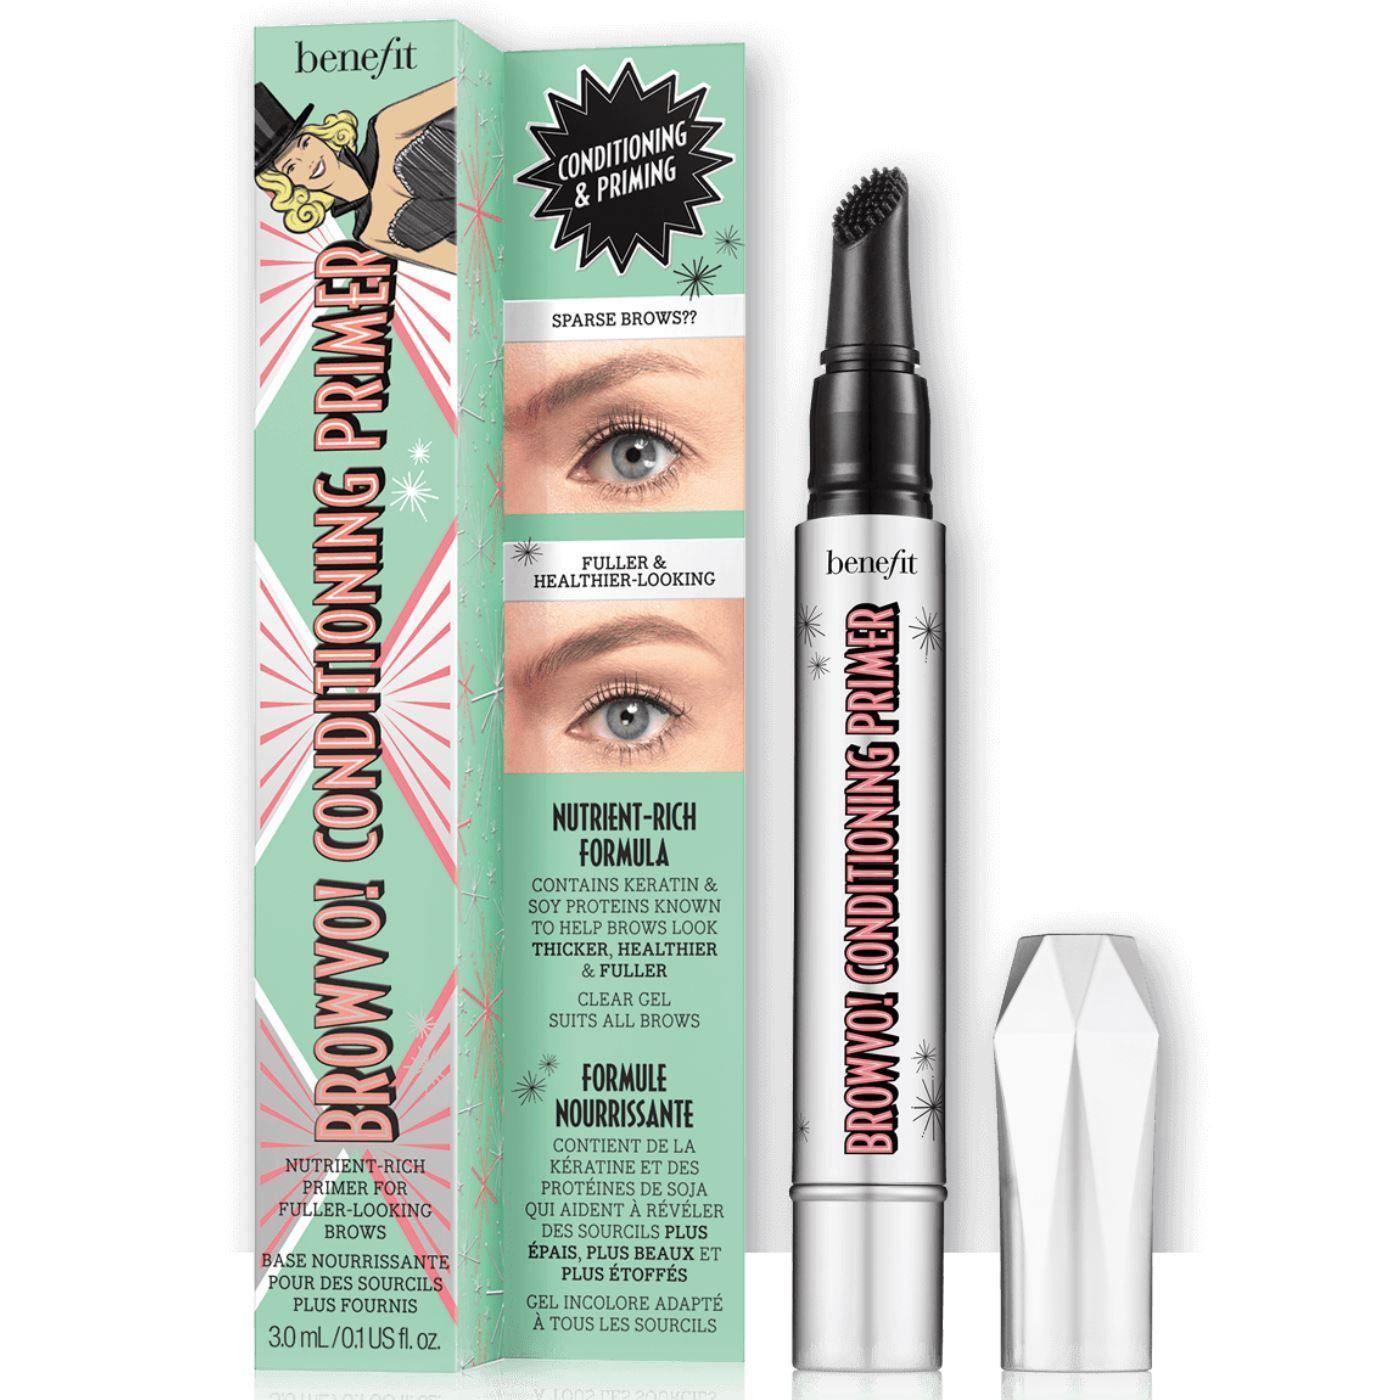 BROWVO! Conditioning Primer Nutrient-Rich Eyebrow Primer